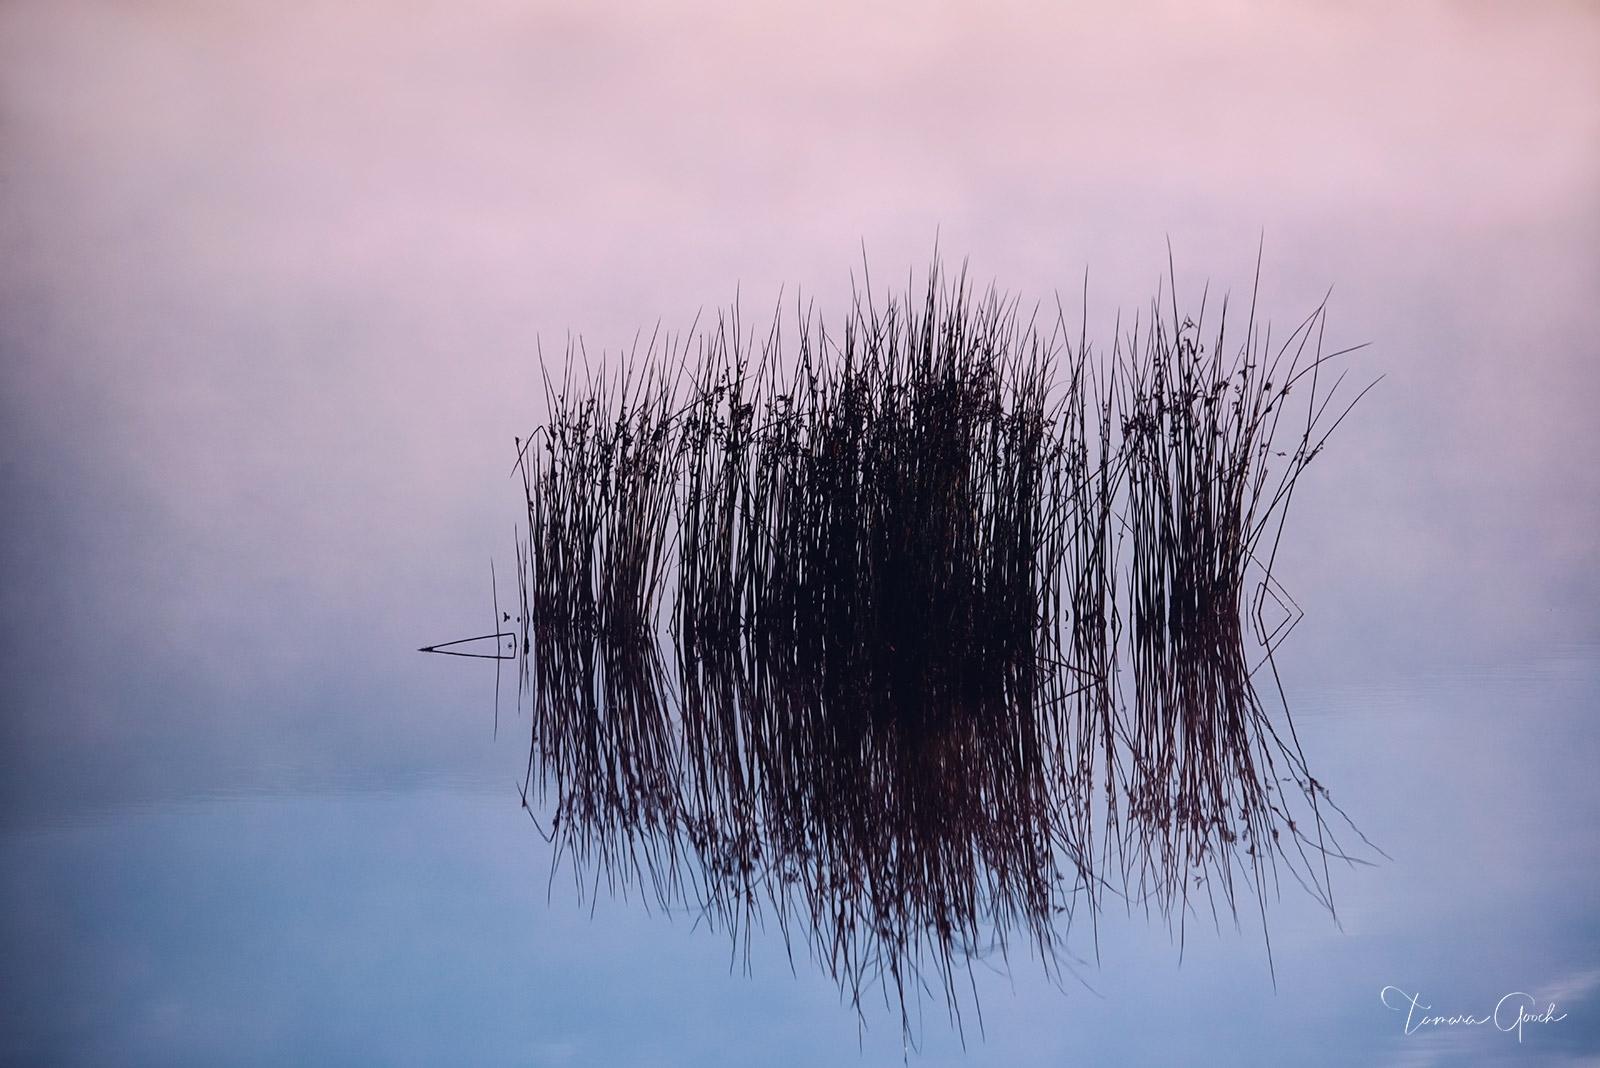 nature, landscape, grasses, fog, water, pond, reflection, reeds, fine art, photography, prints, nature, therapy,  calm, zen, image, images, photo, photos, photograph, buy, for sale, aluminum, canvas, , photo